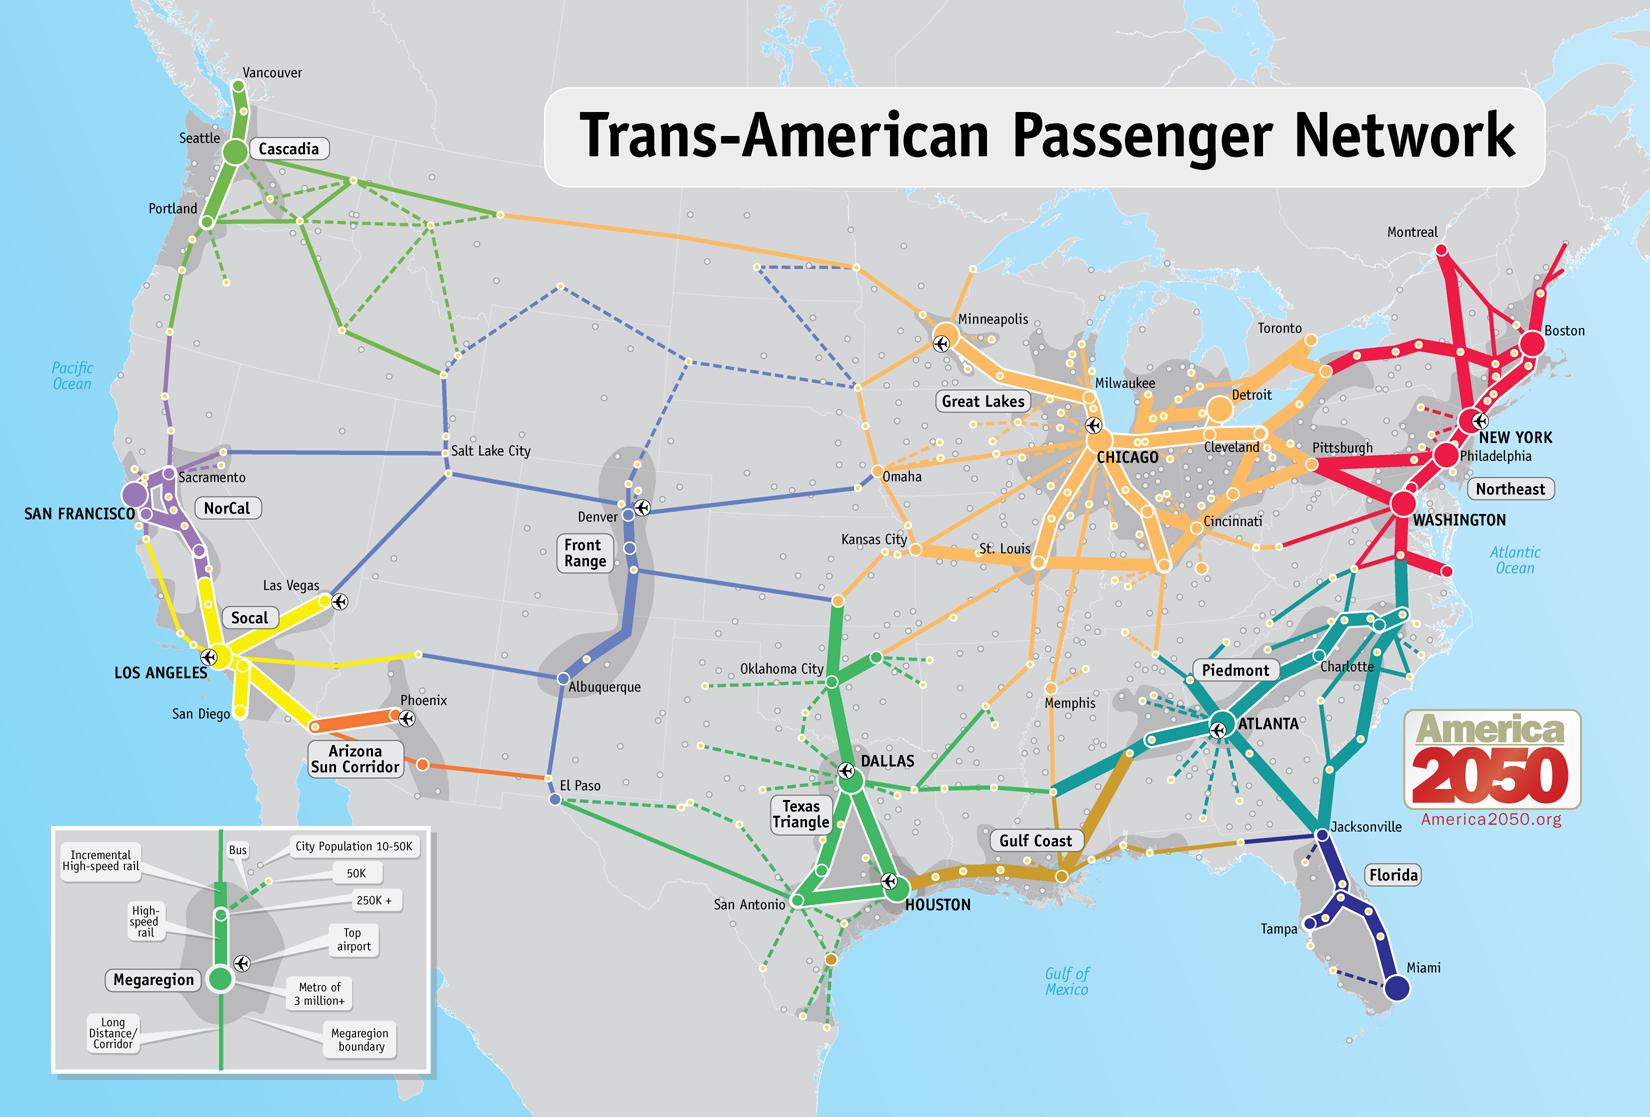 Our Maps - America 2050 - Texas High Speed Rail Map